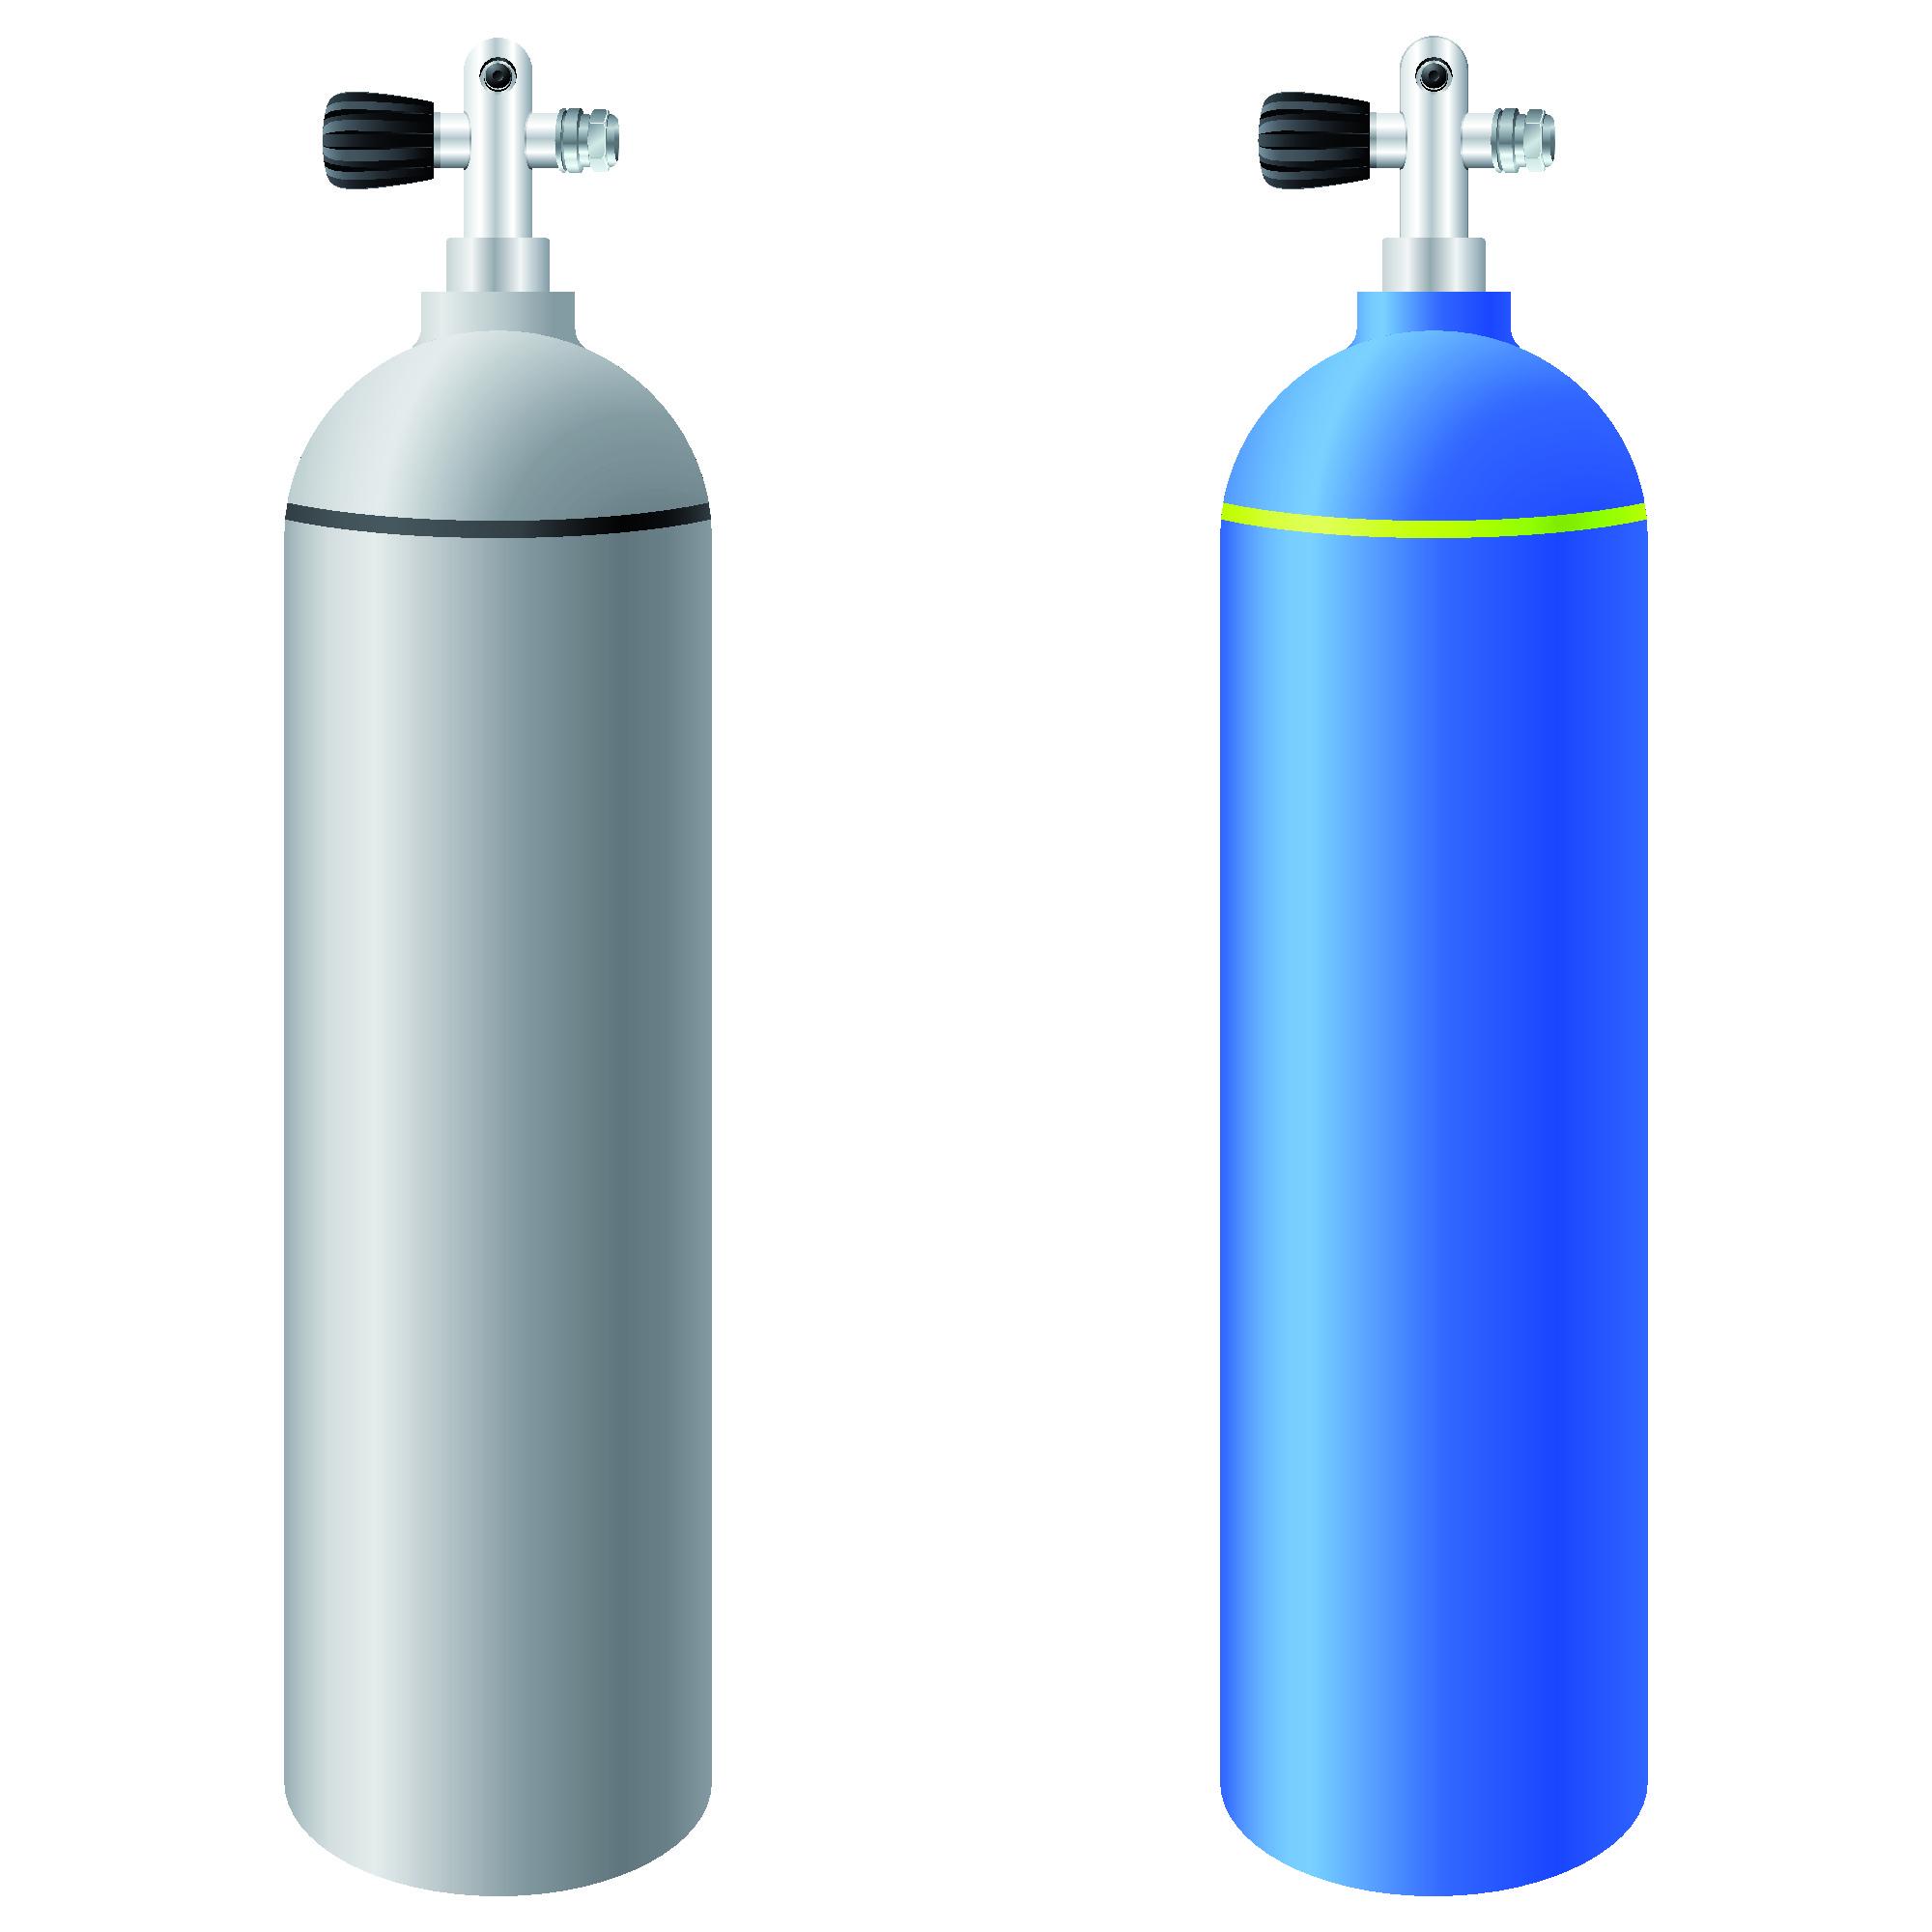 Gases Around Us